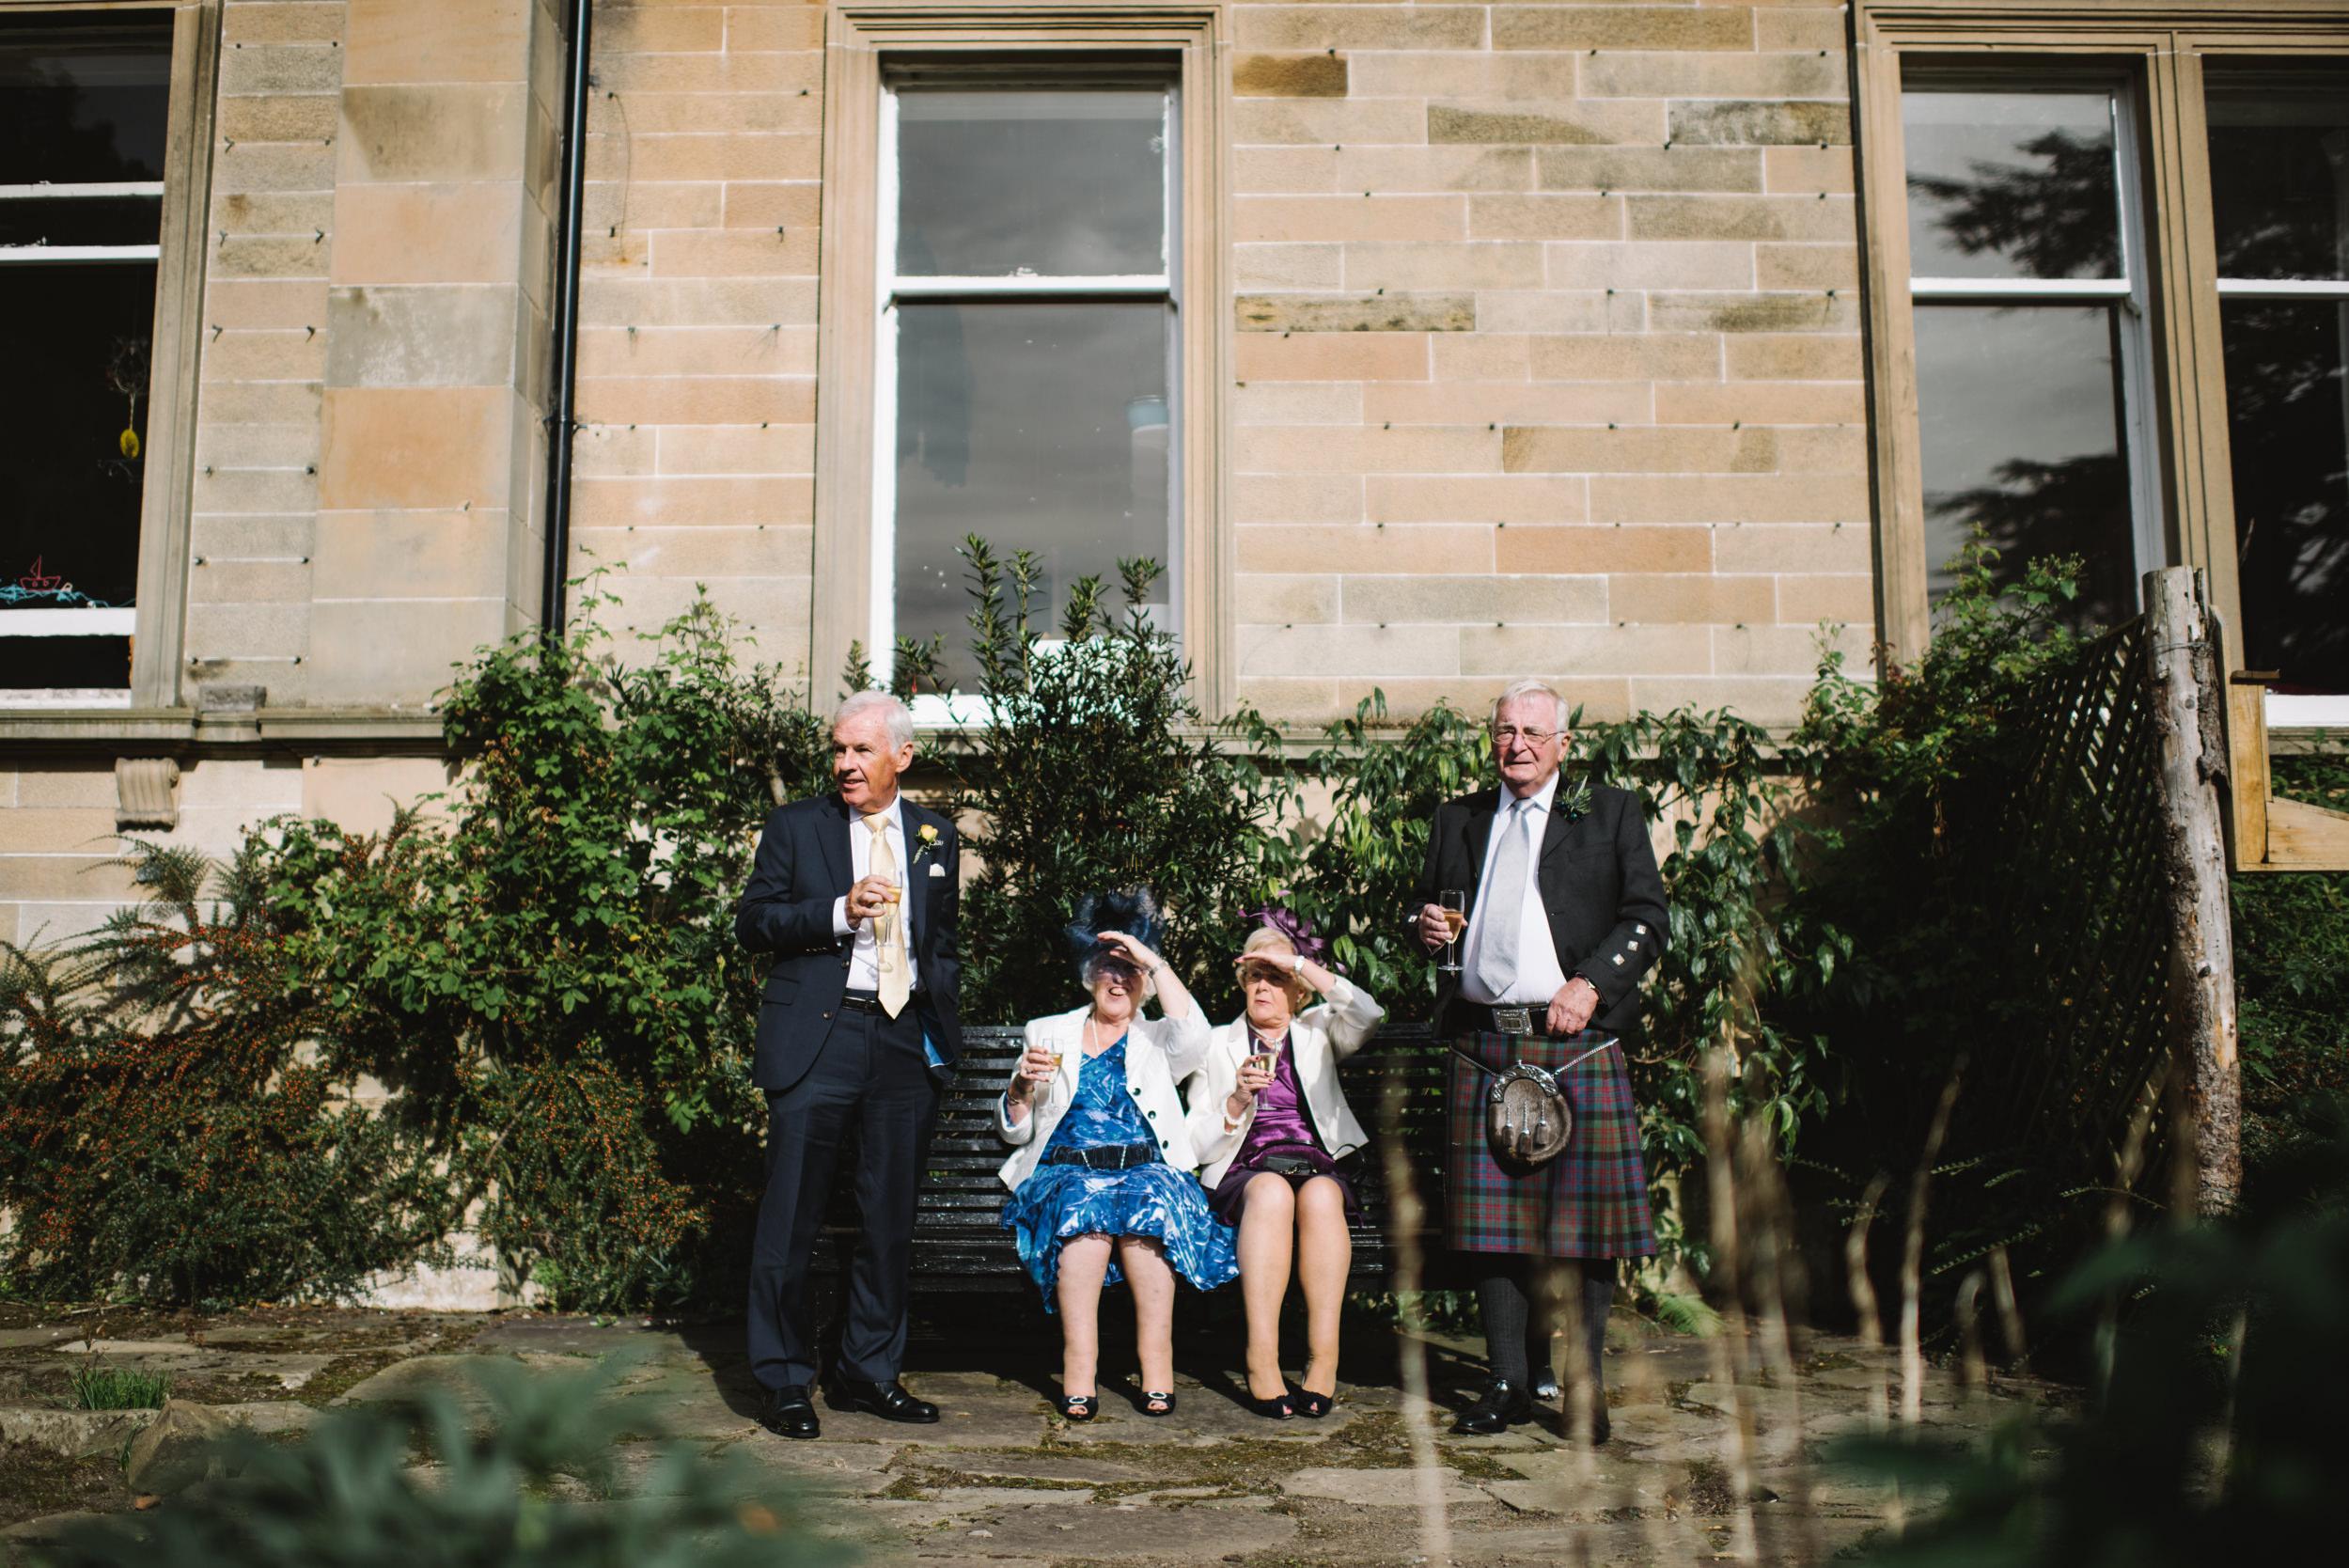 0145-alternative-wedding-portrait-family-kids-photographer-glasgow-scotland.JPG